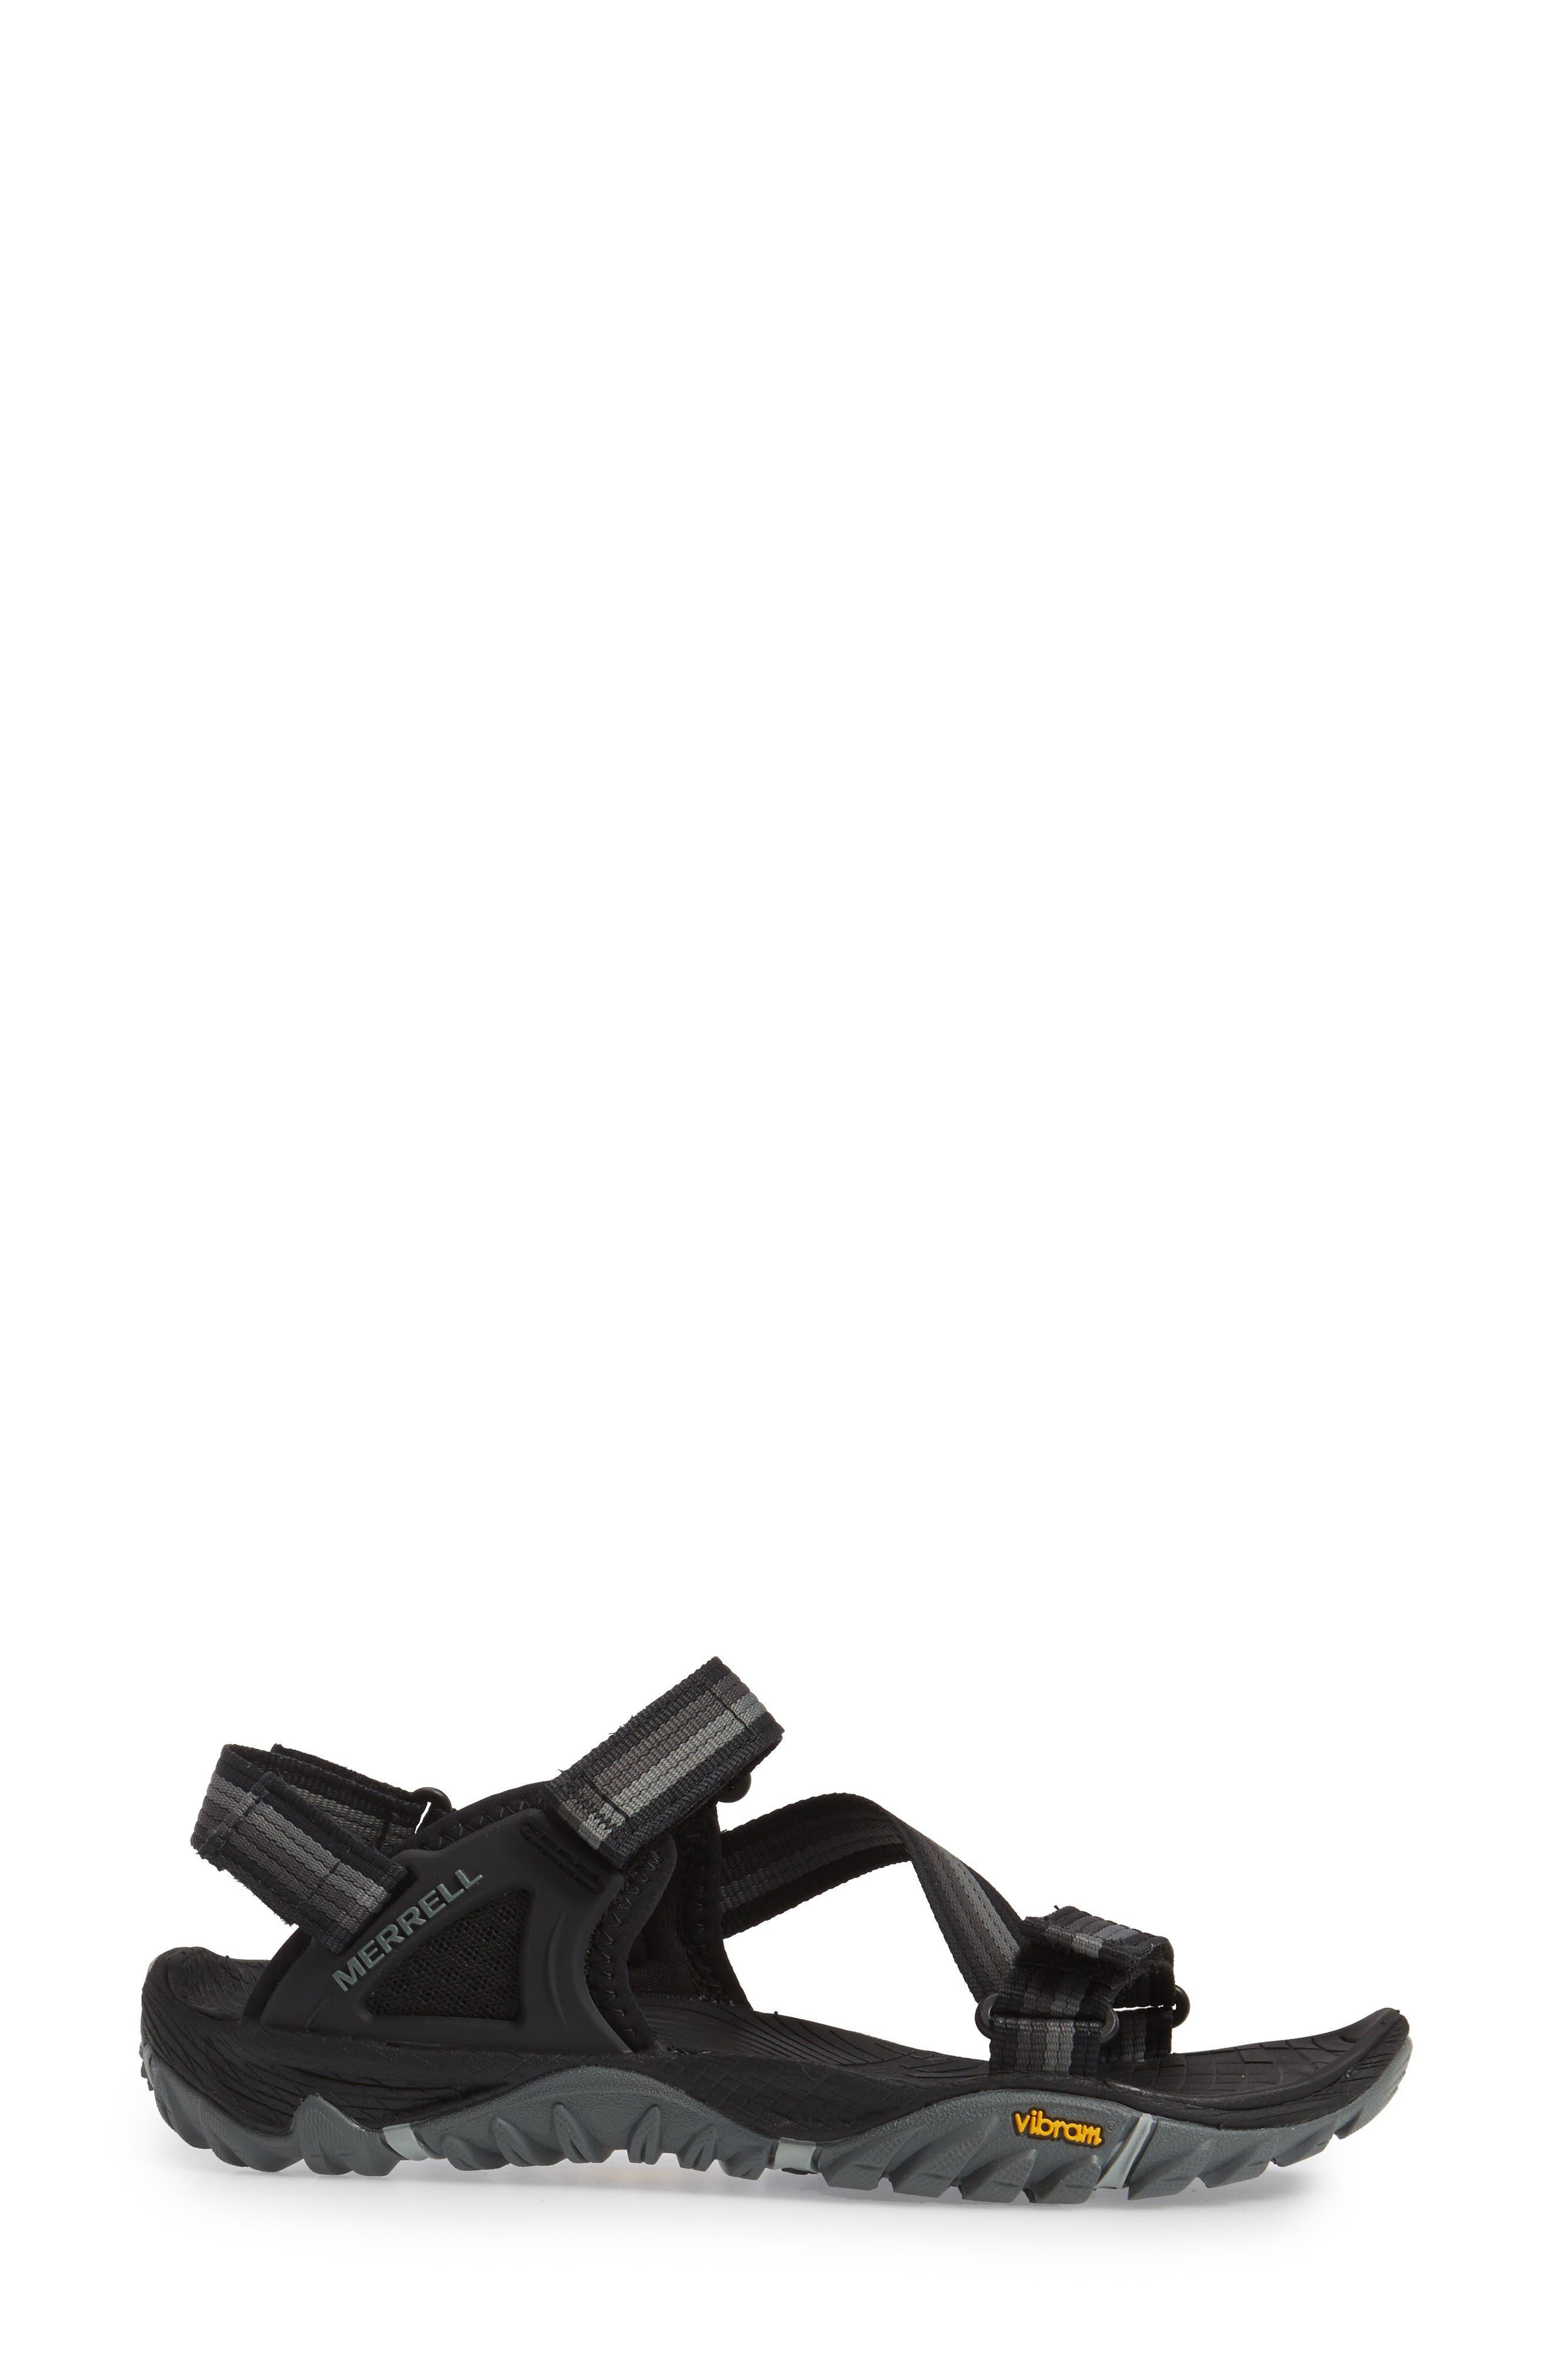 All Out Blaze Sport Sandal,                             Alternate thumbnail 3, color,                             Black Fabric